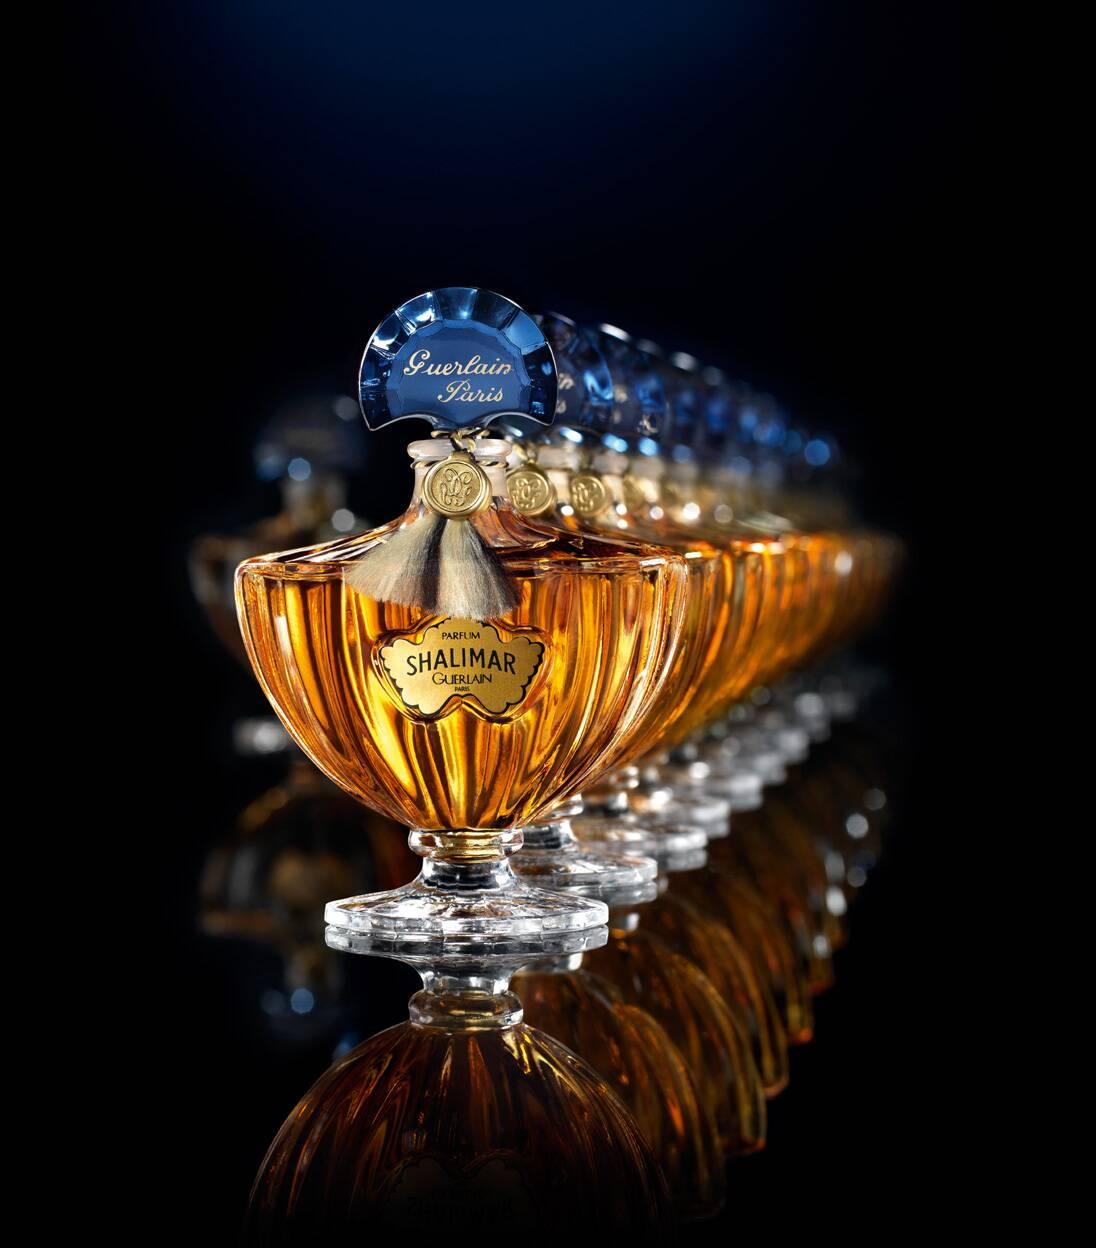 Guerlain, artisan perfumer, makeup - Perfumes & Cosmetics ...